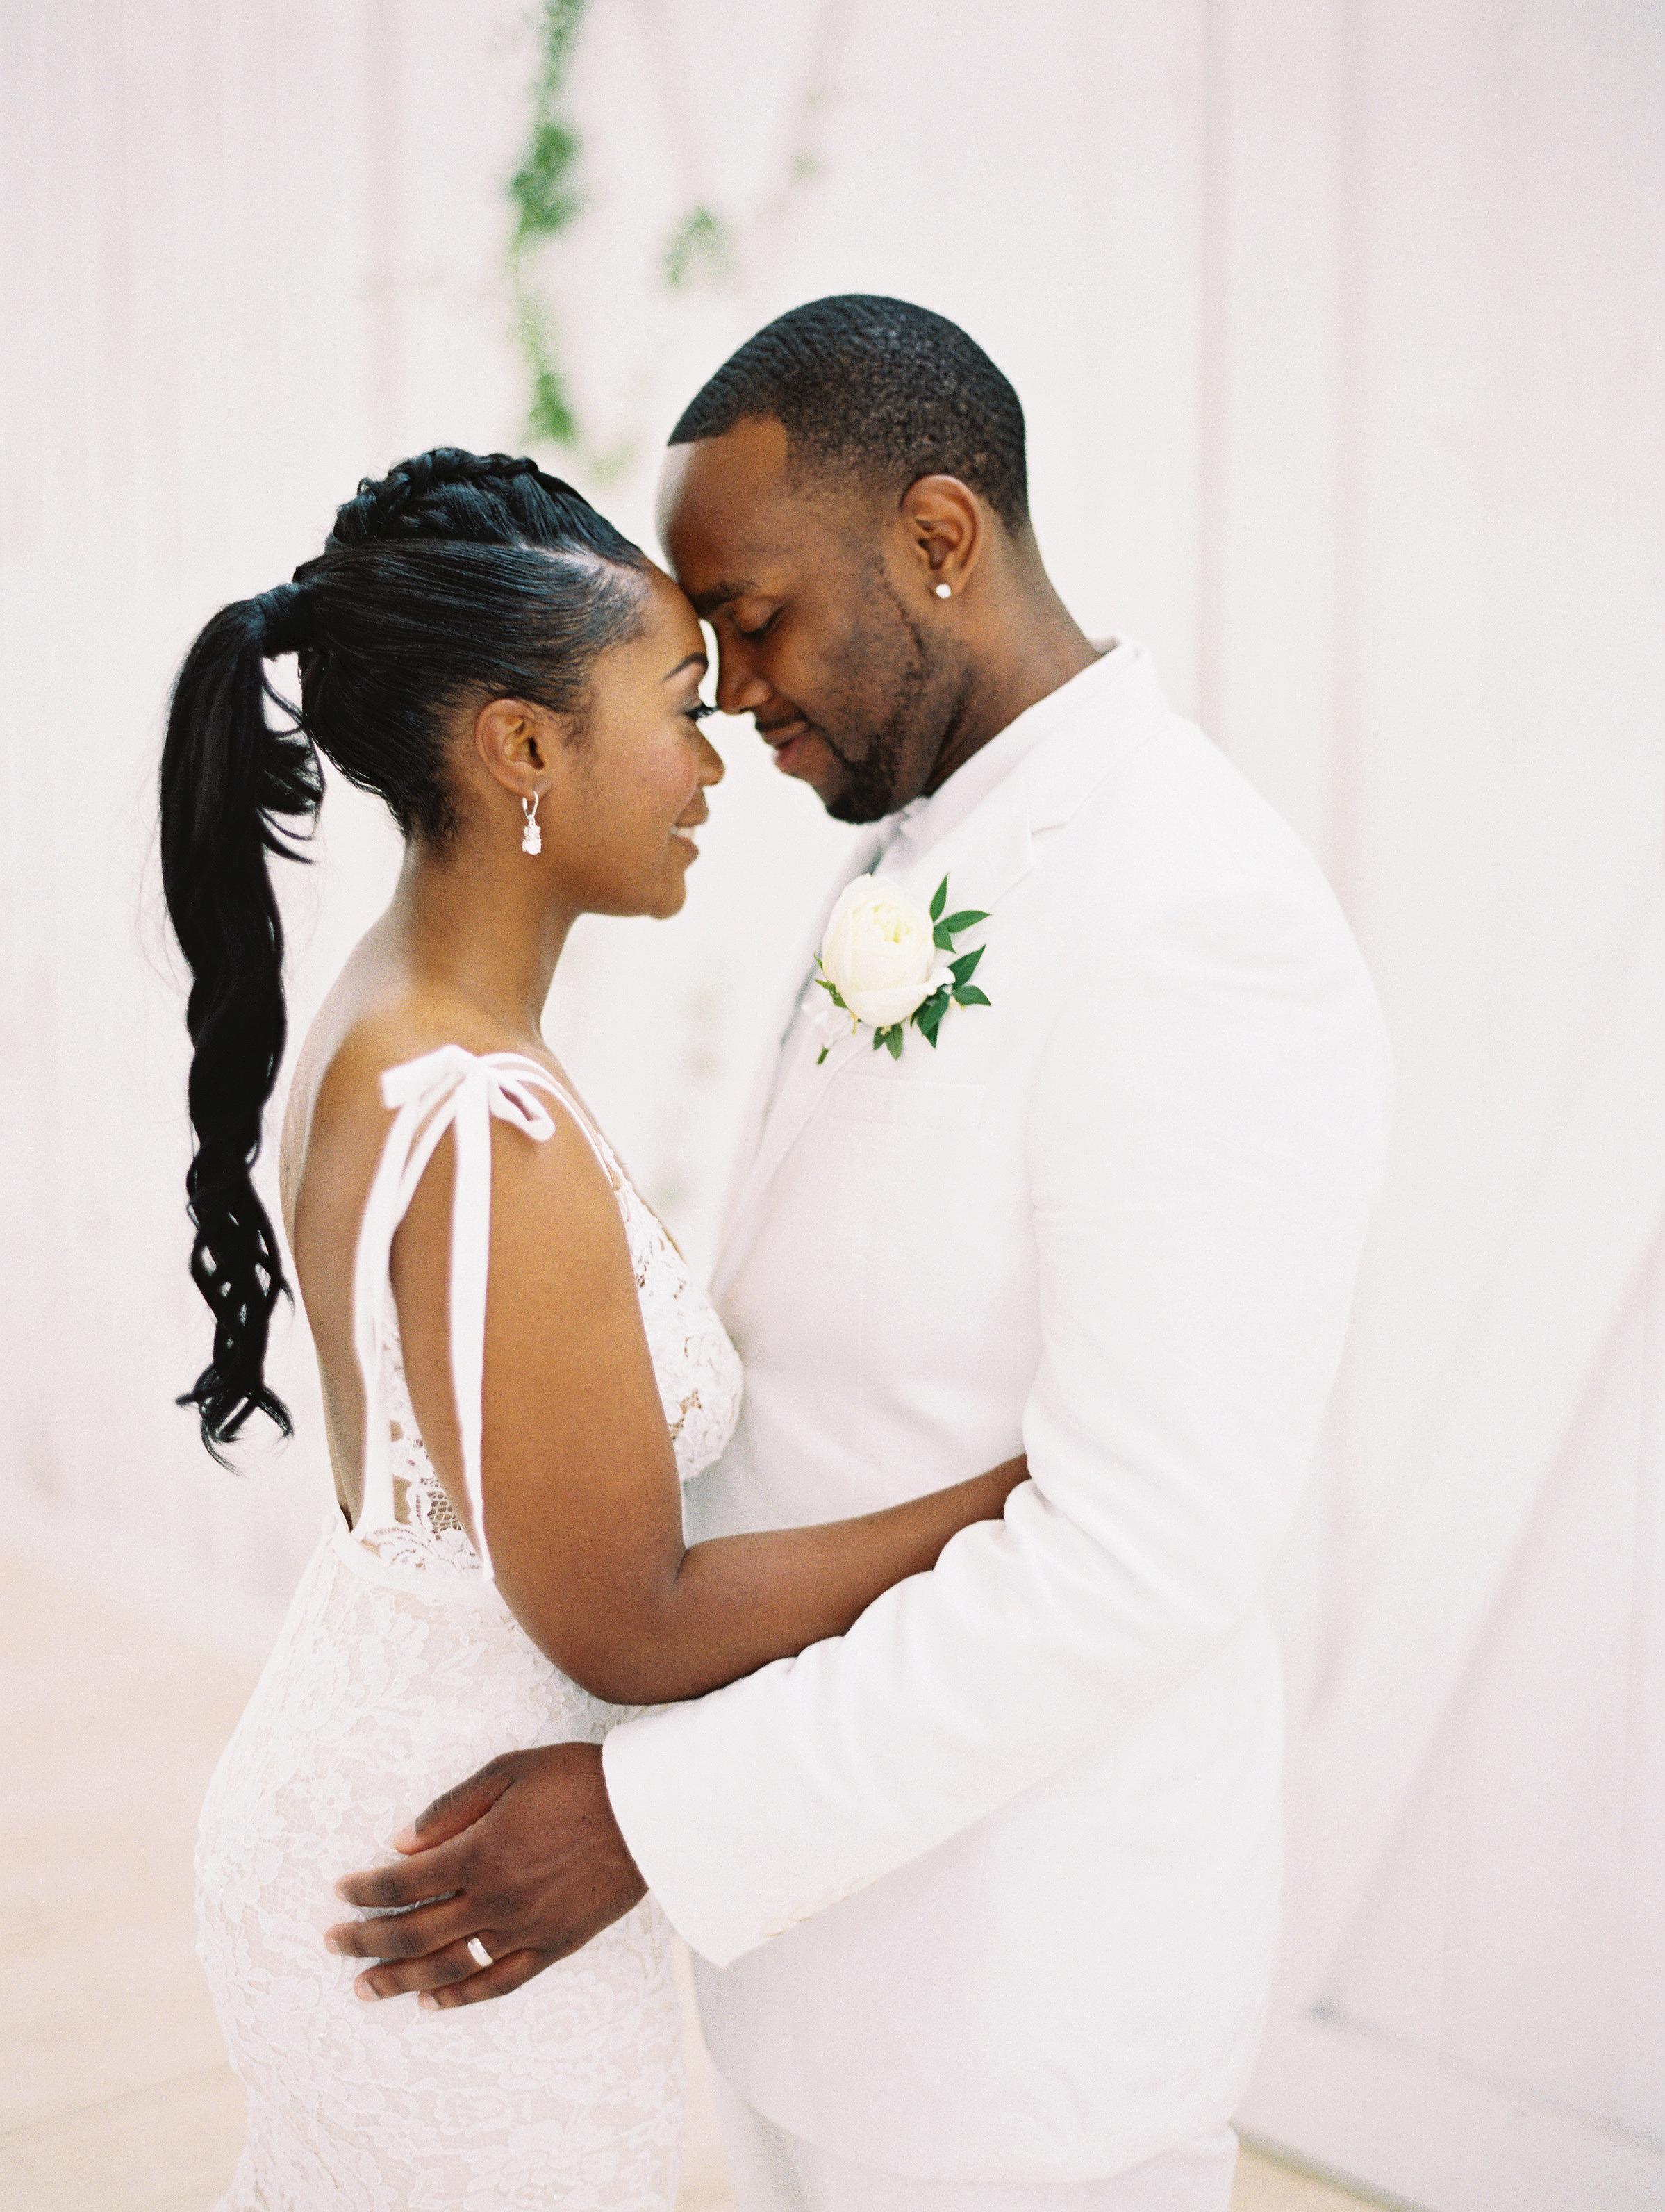 shakira travis wedding couple face to face